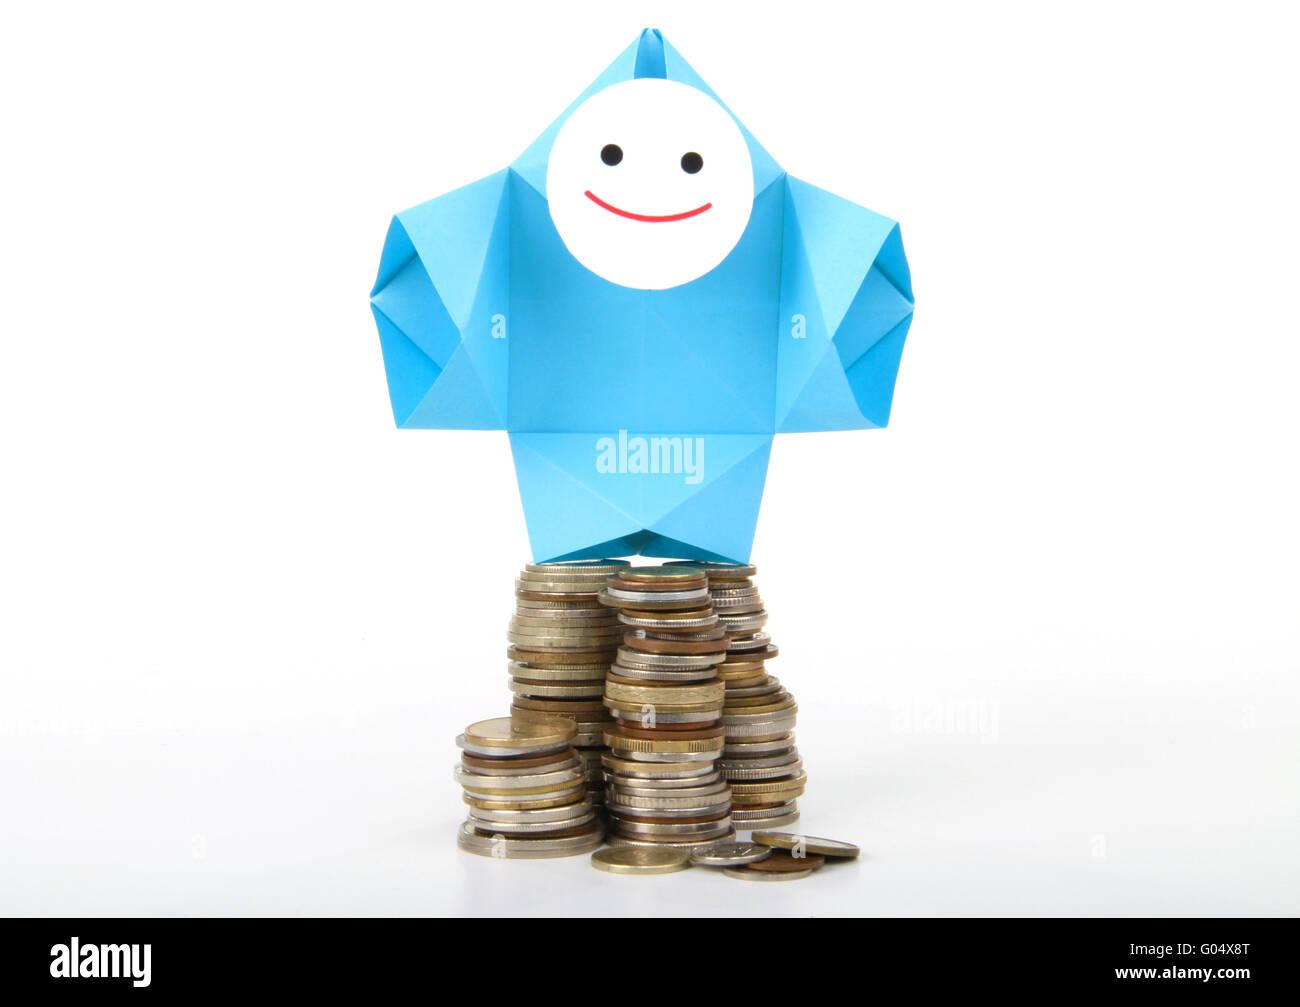 Conceptual image of money, earnings, and savings - Stock Image